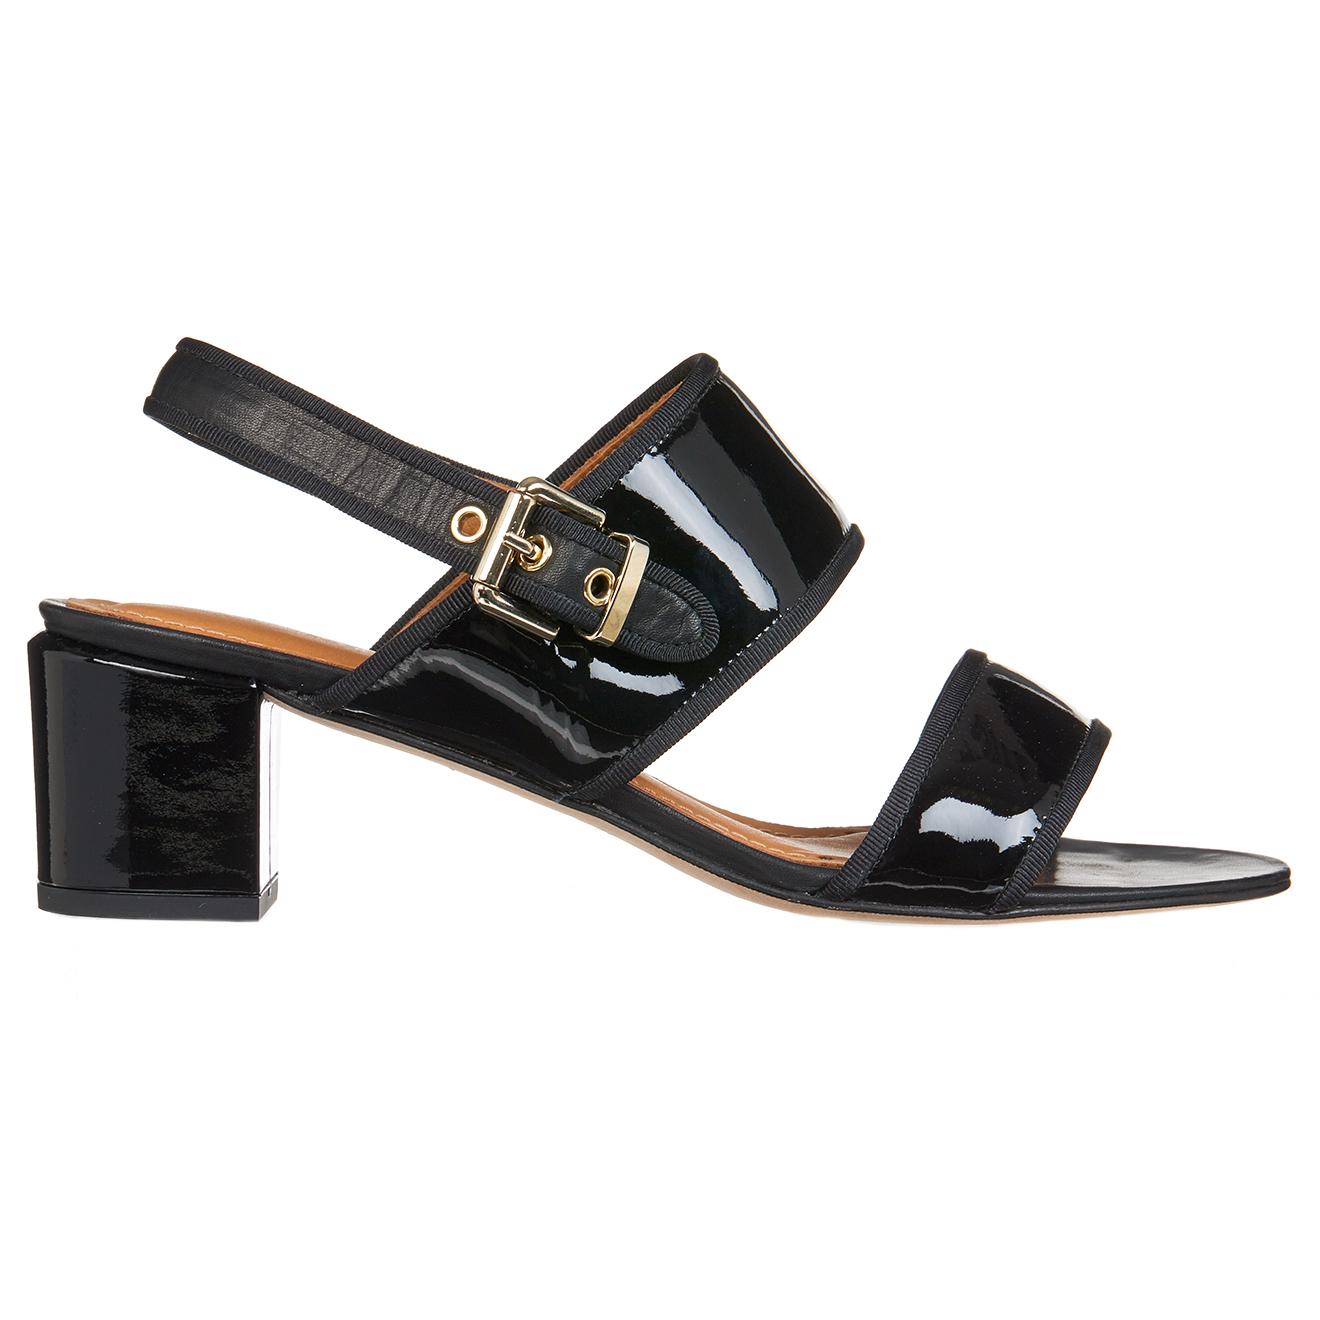 Chaussures en Cuir noires Talon 4.5 cm - Vanessa bruno - Modalova